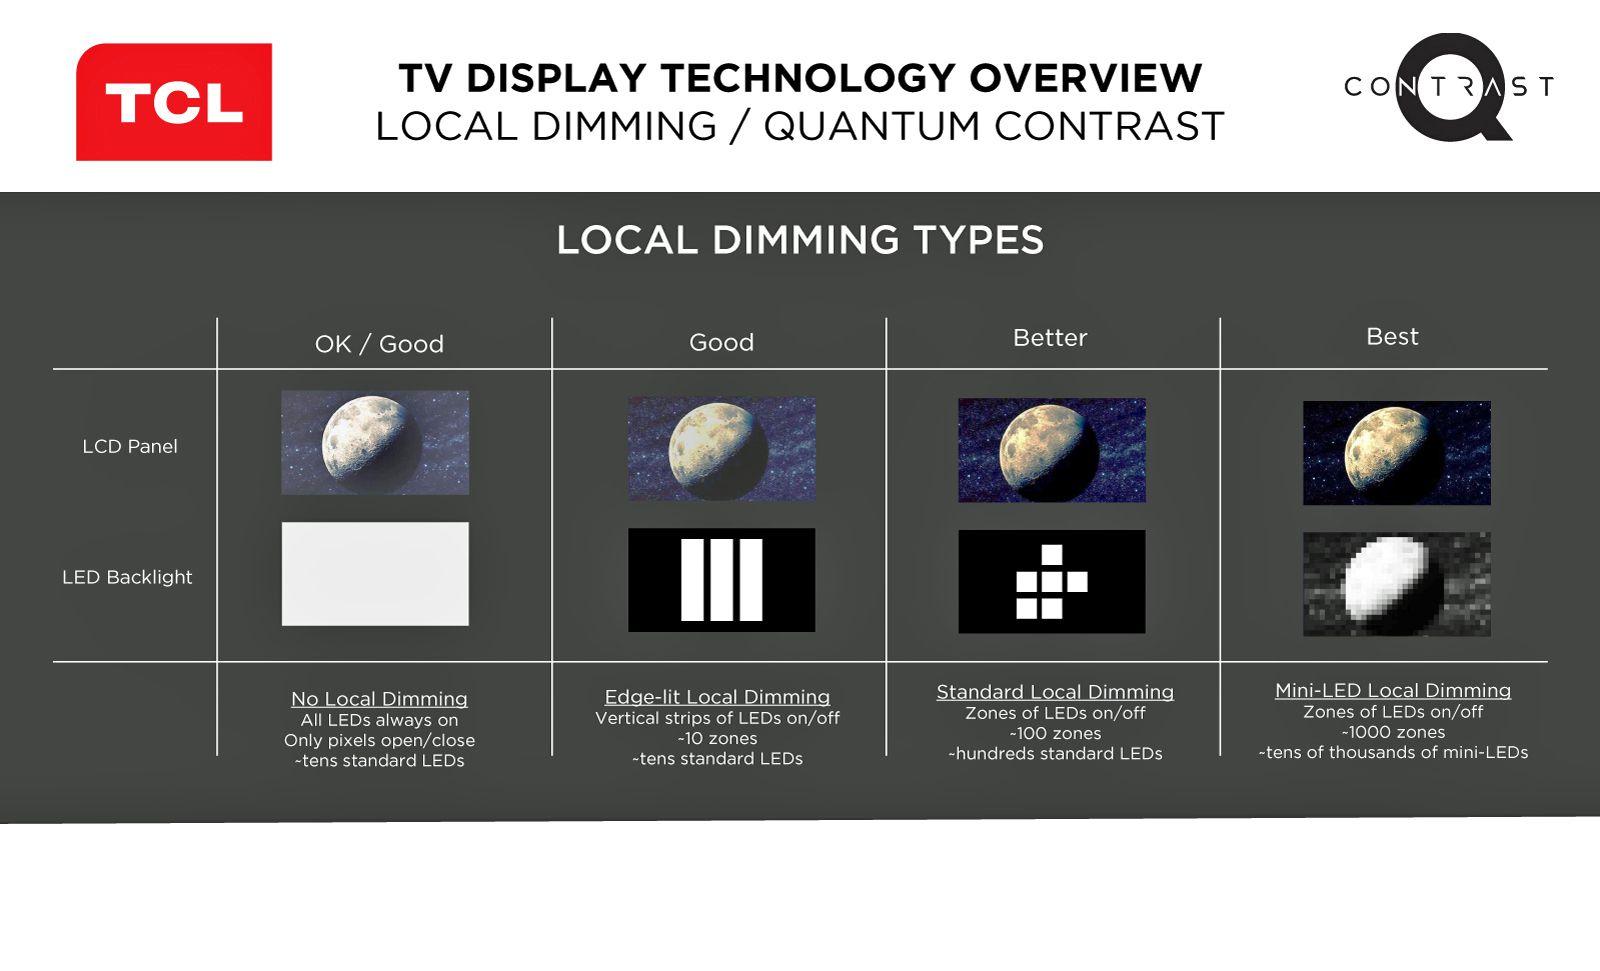 TCL Mini LED Chart